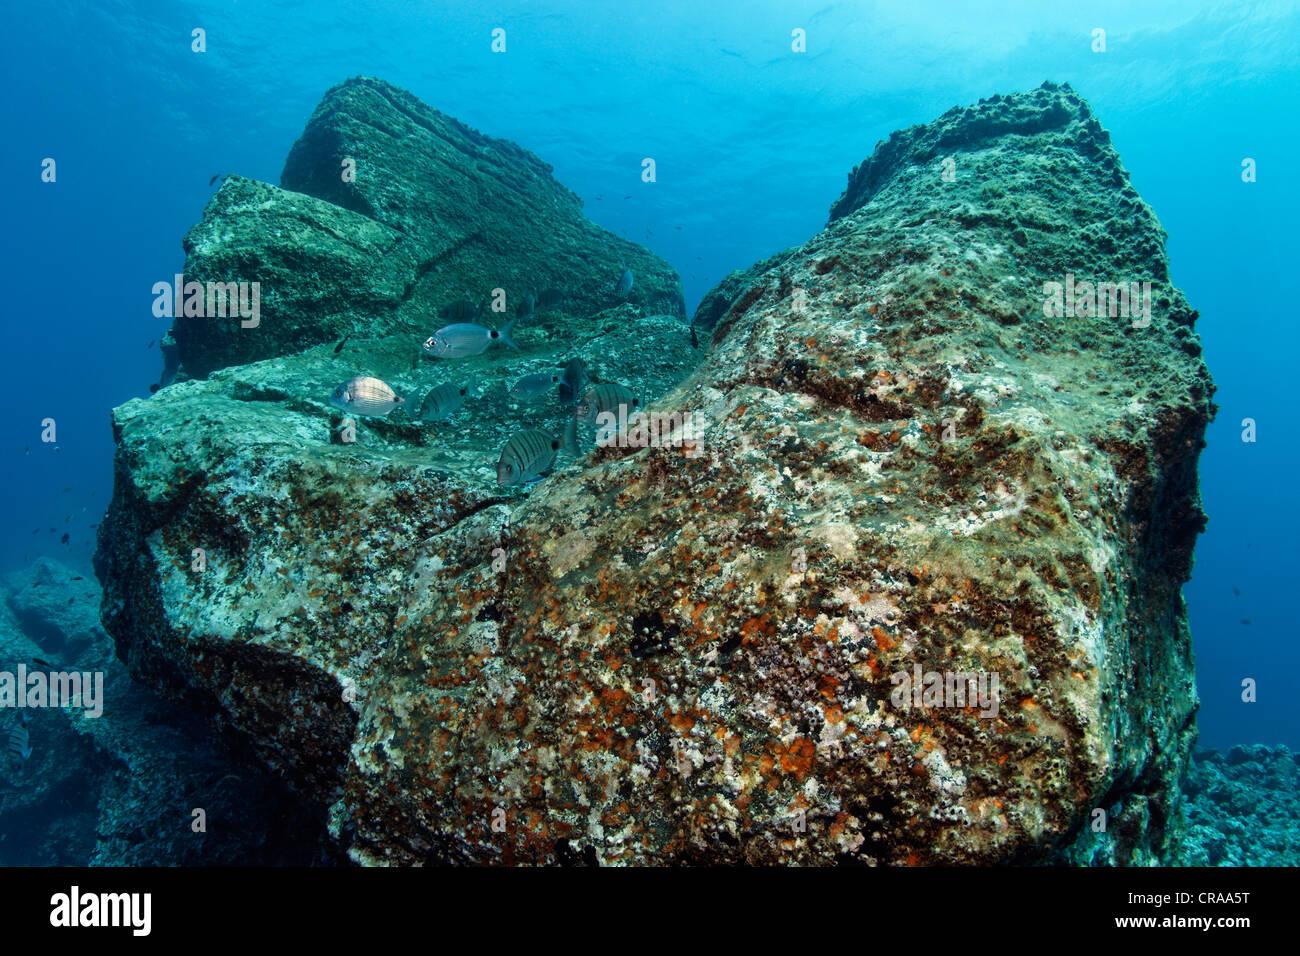 Rock con Acorn percebes (Balanus trigonus) y africanos Pargo blanco o Sargo (Diplodus sargus cadenati), Madeira, Portugal Foto de stock